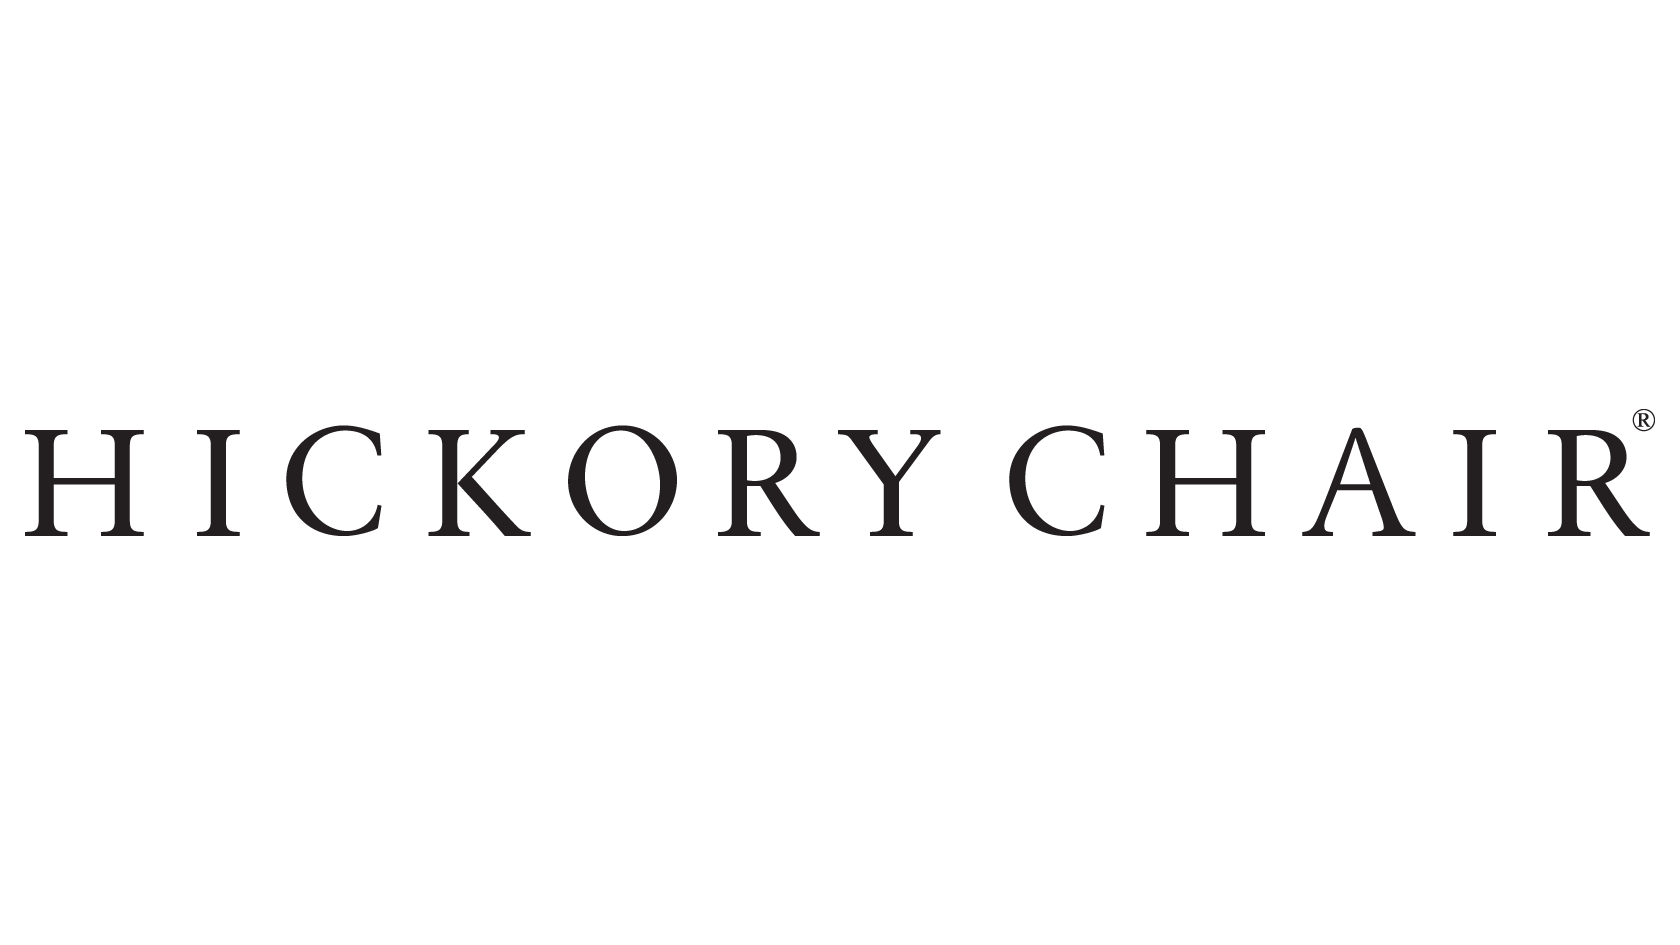 Hickory Chair logo, 2021 Flower magazine showhouse sponsor for furniture